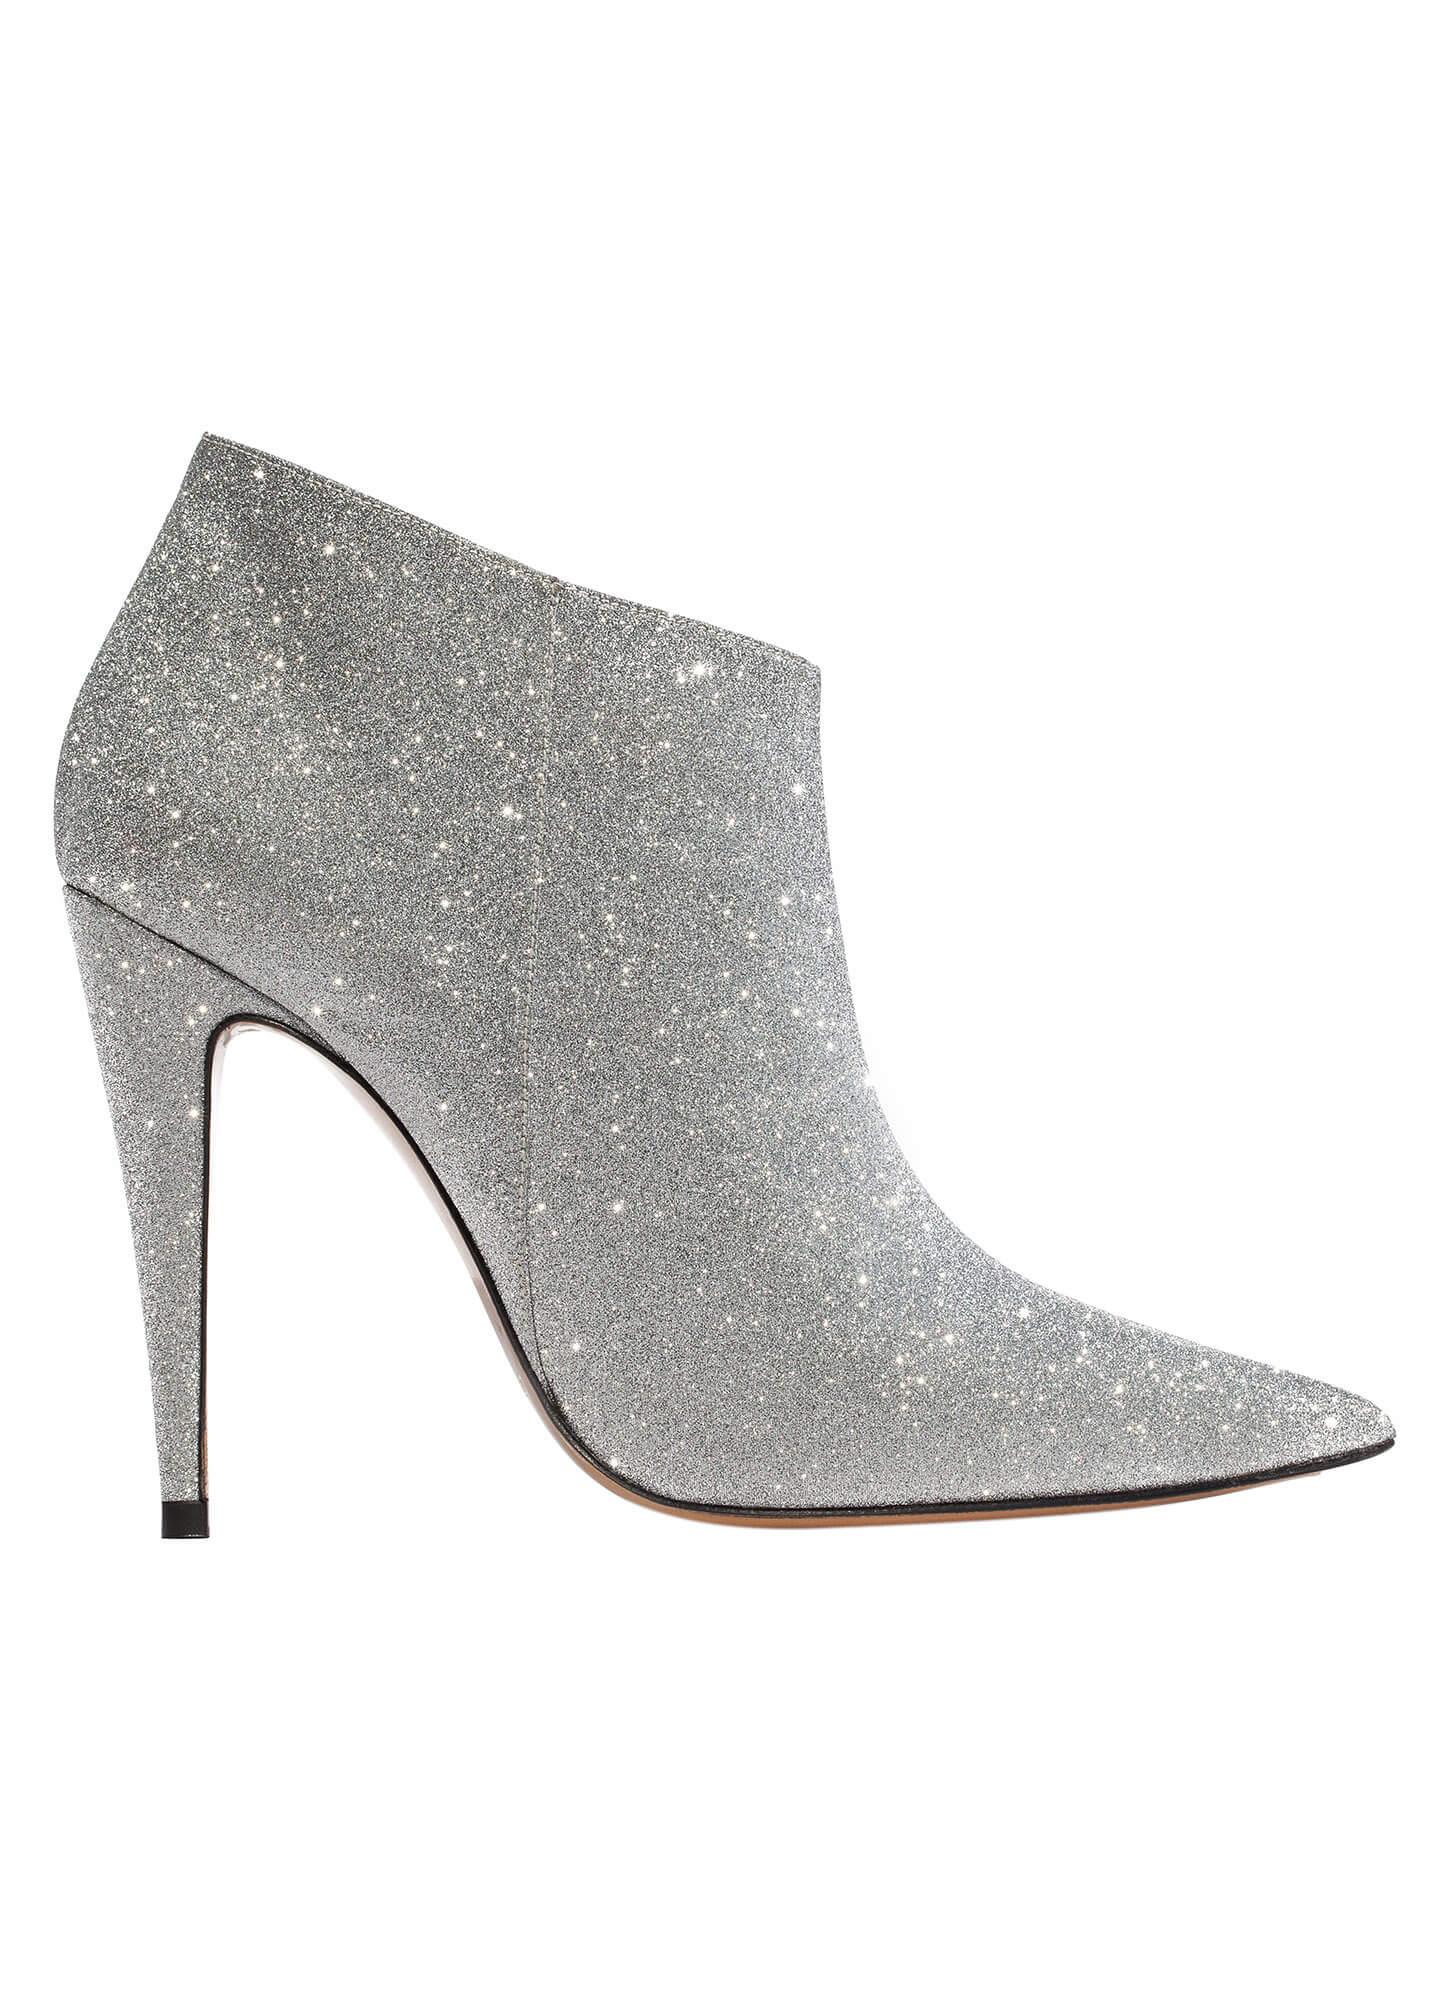 dfee9fe03821 Silver high heel ankle boots - online shoe store Pura Lopez . PURA LOPEZ